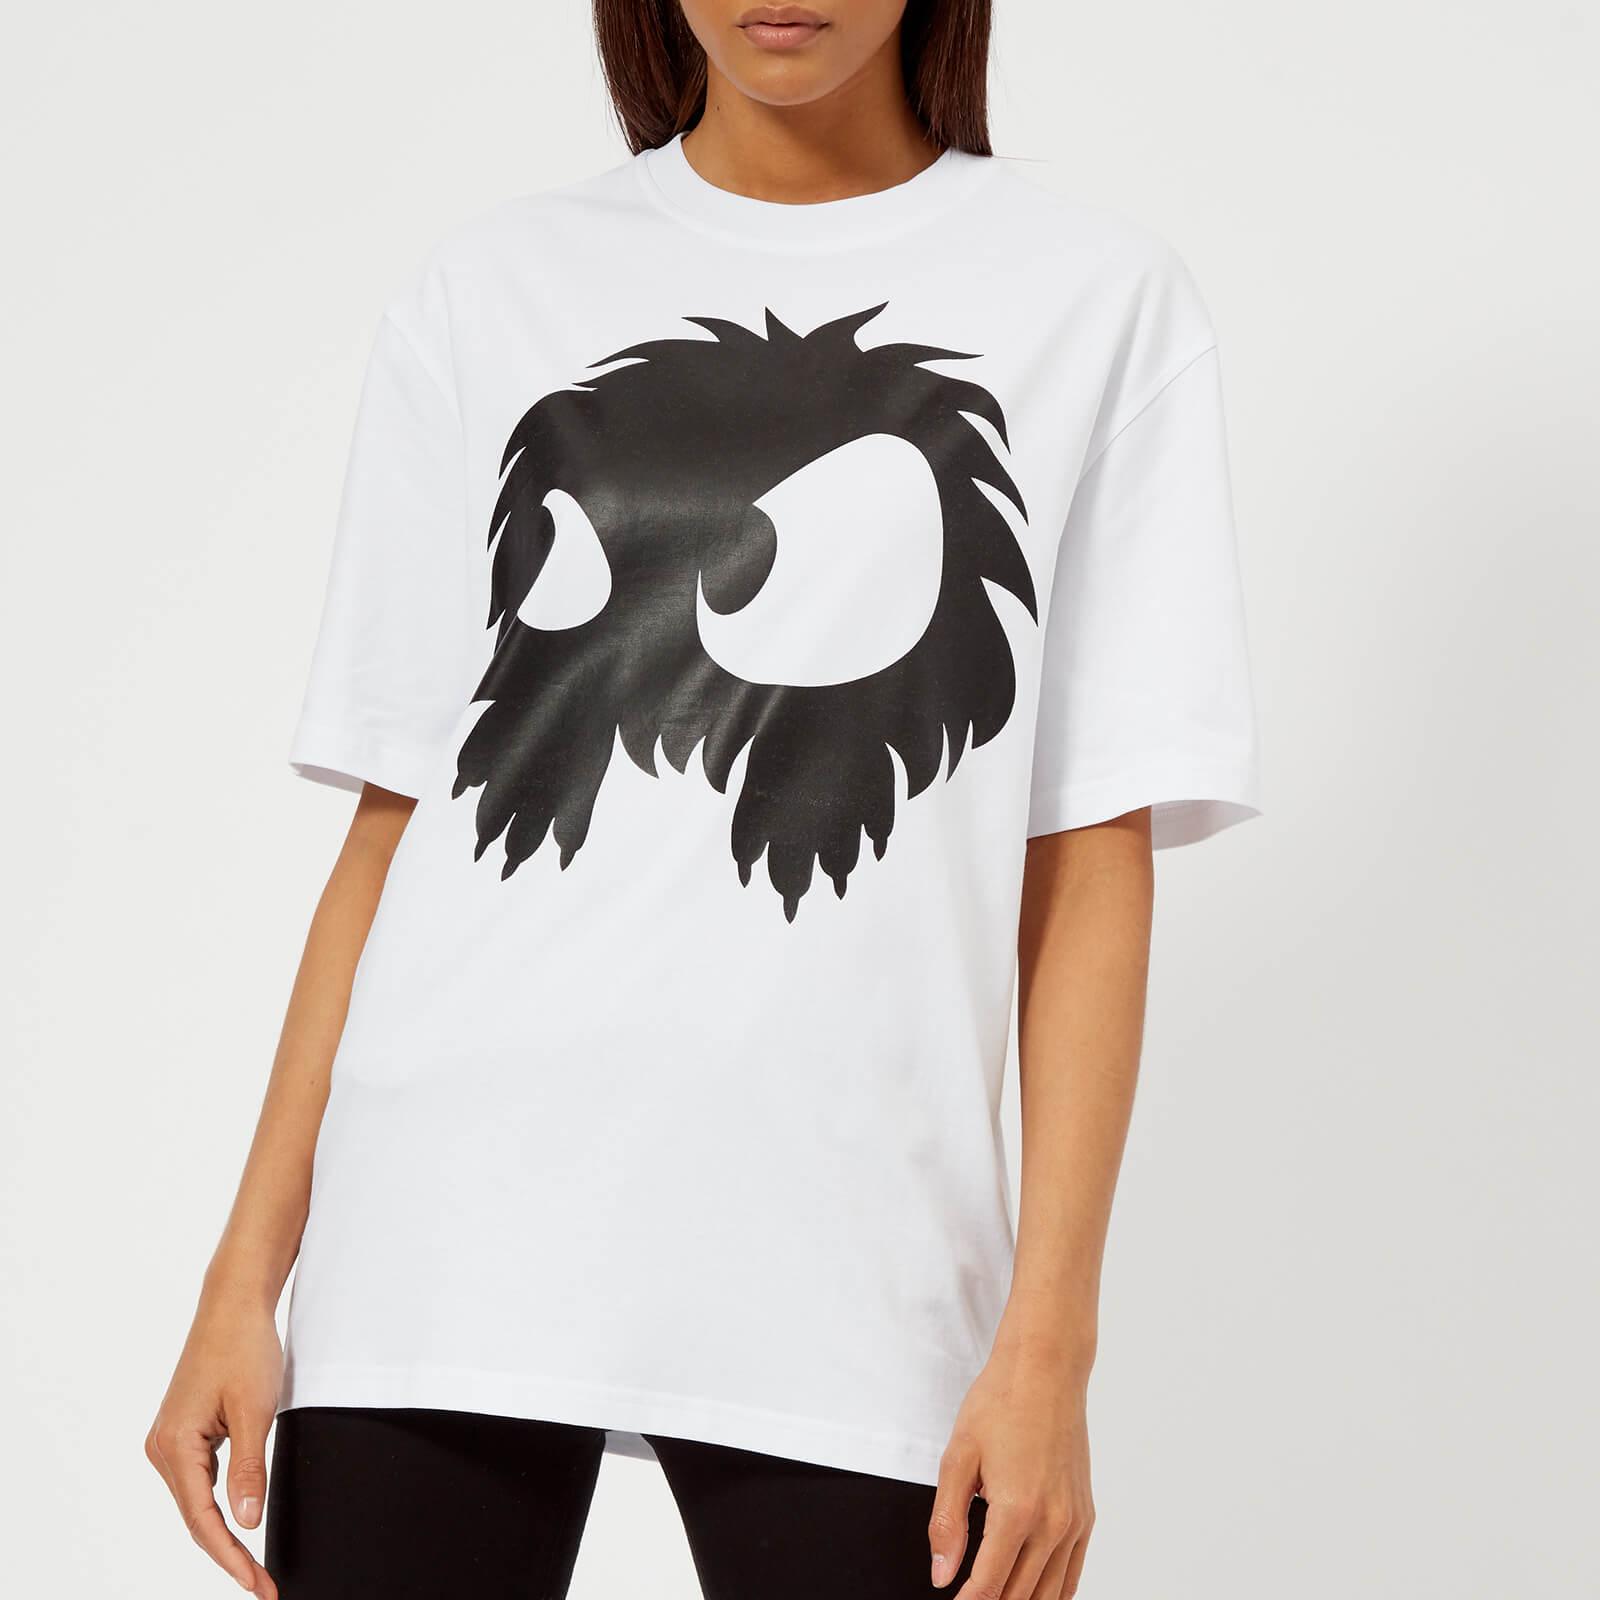 42d0a9d4 McQ Alexander McQueen Women's Boyfriend Chester Monster T-Shirt - Optic  White - Free UK Delivery over £50